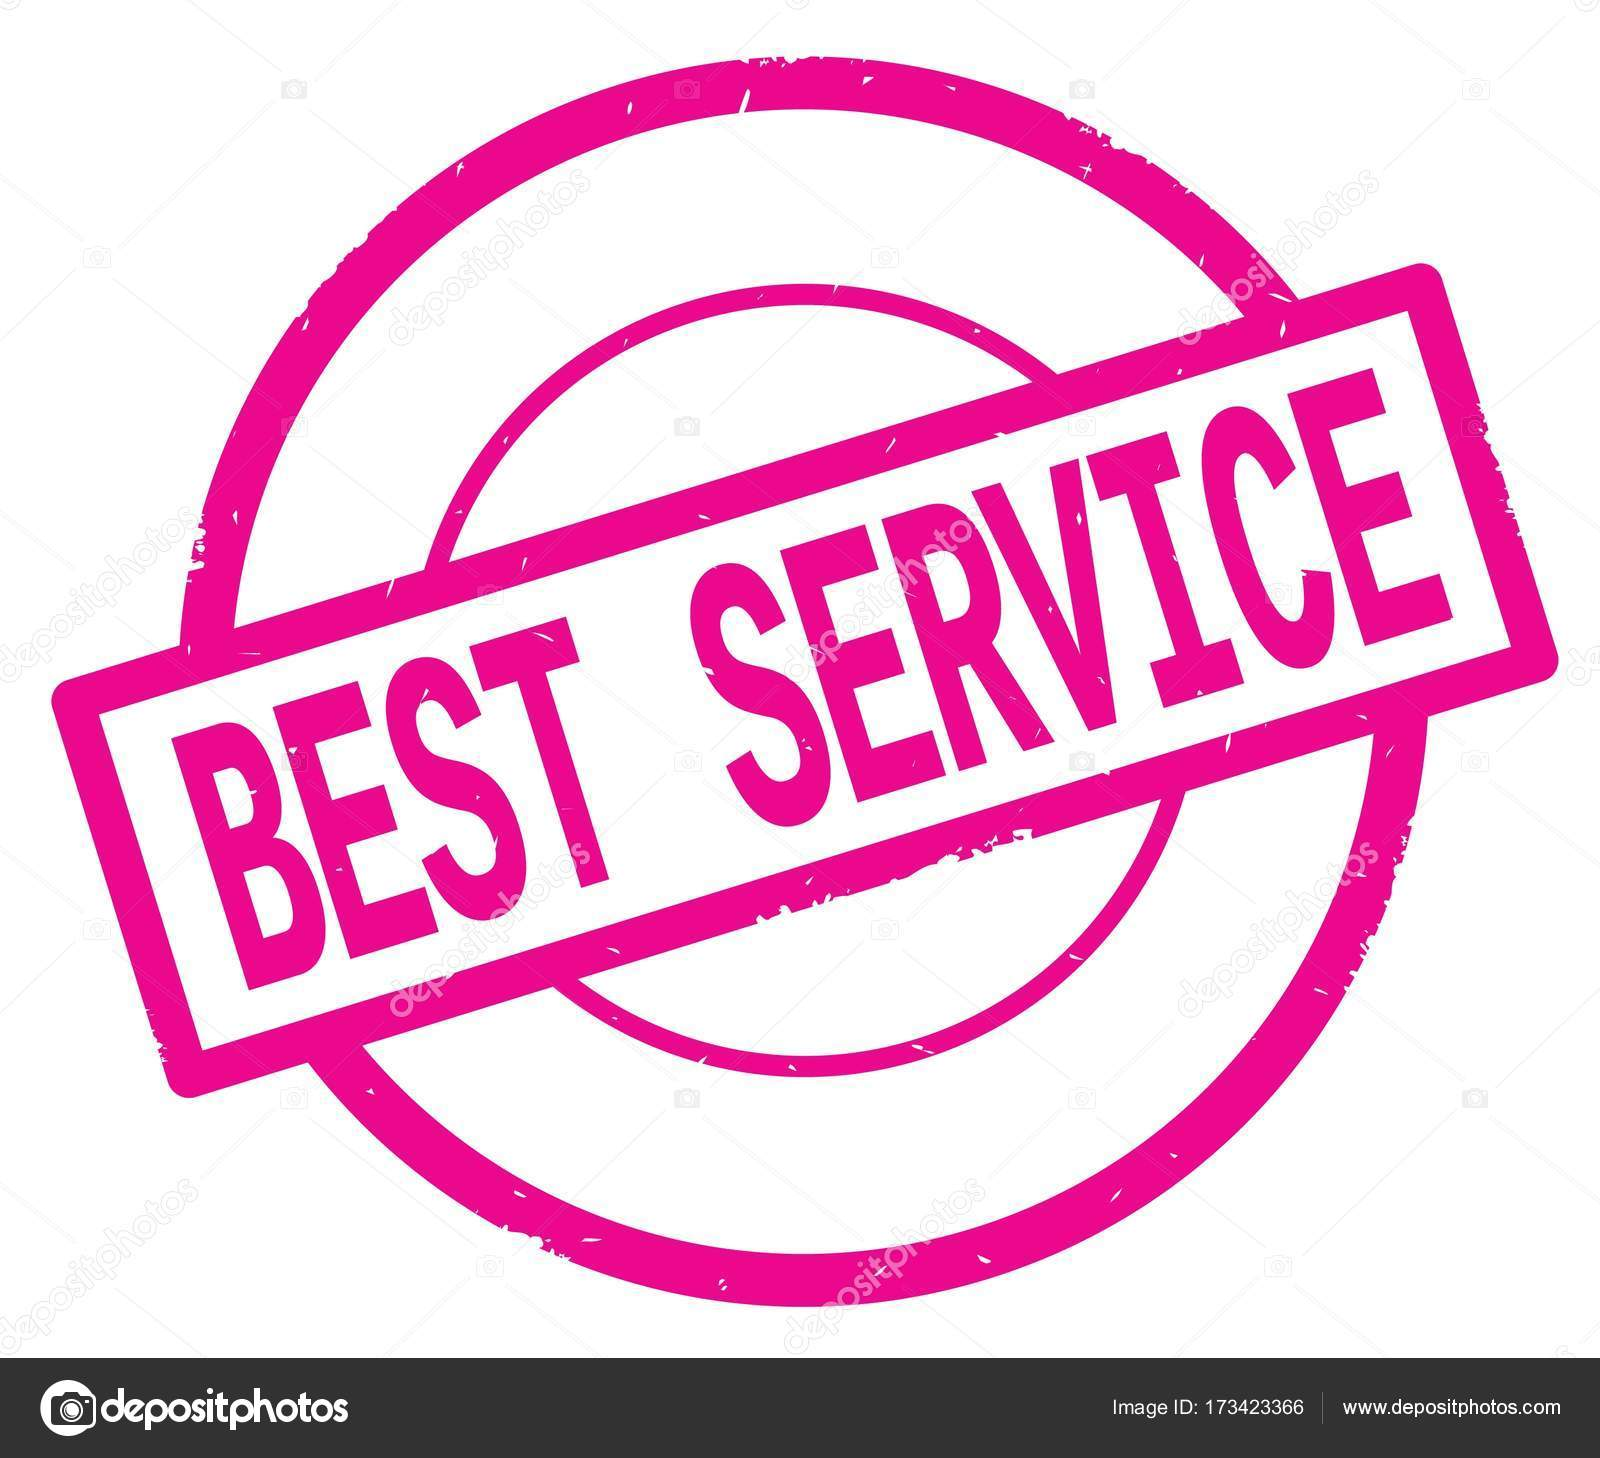 Bester Service, geschriebene Text auf rosa einfacher Kreis Stempel ...